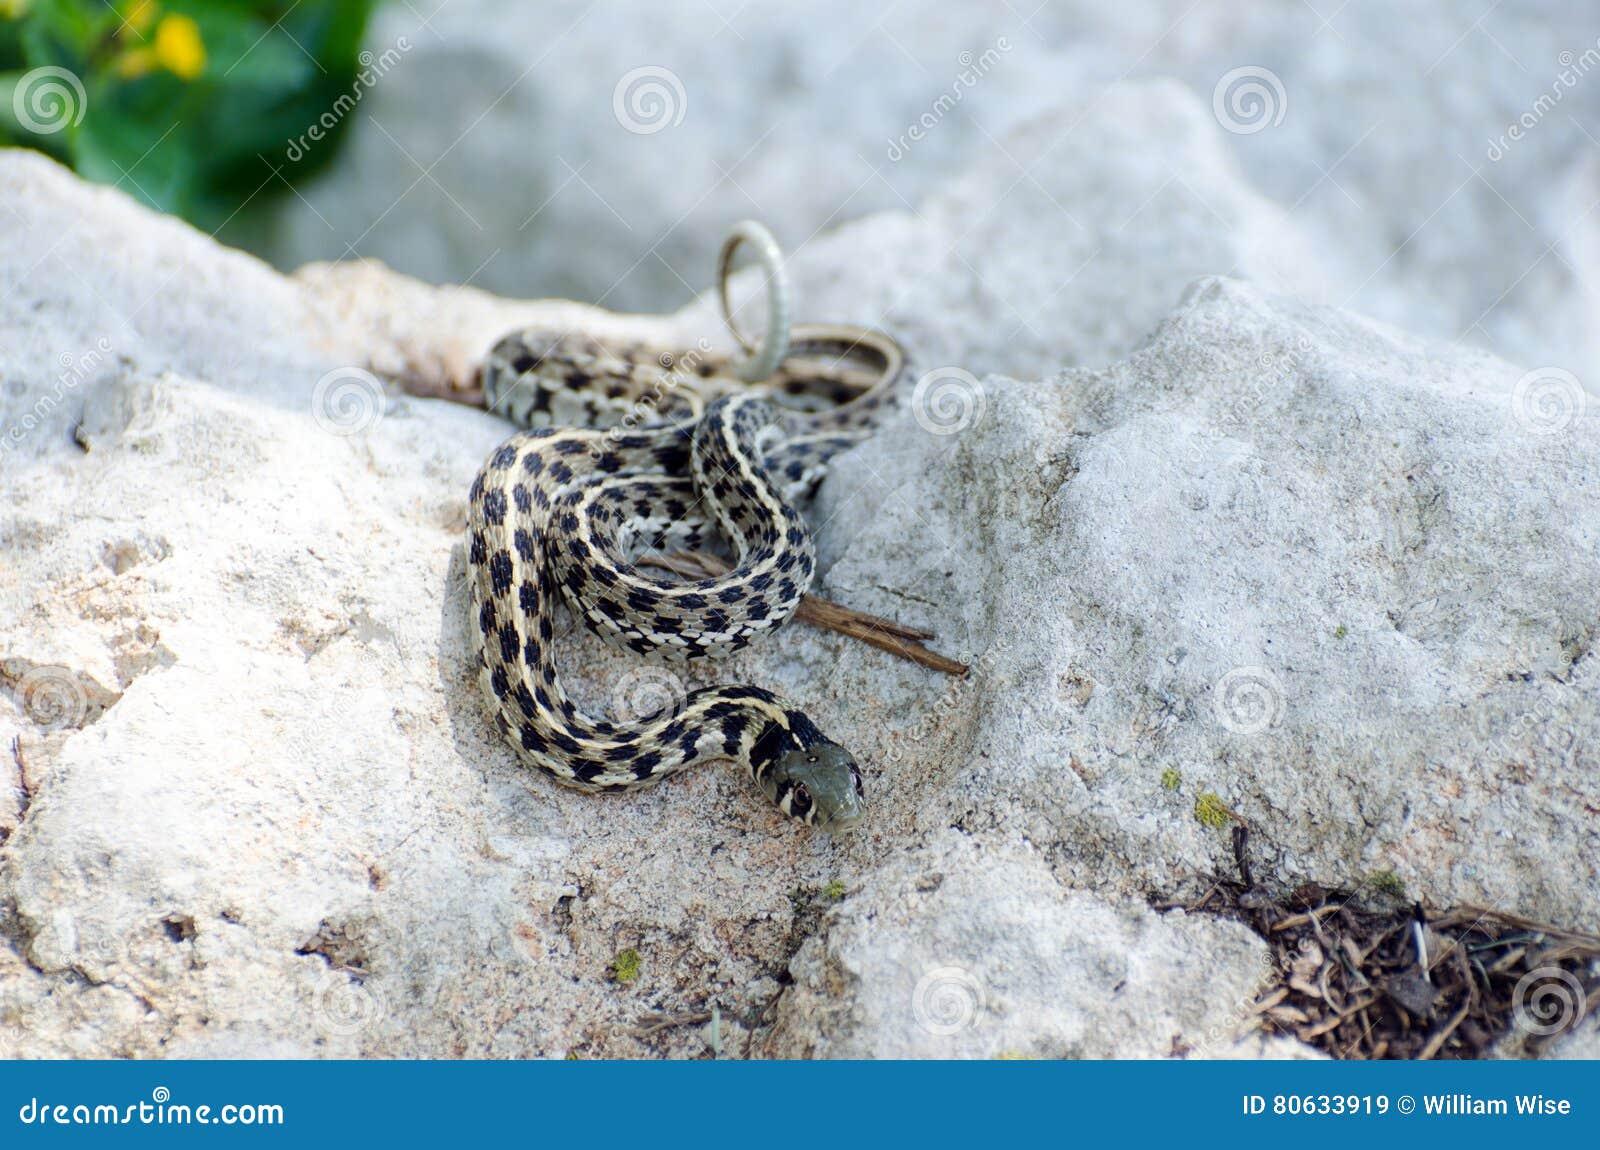 Texas Checkered Garter Snake Stock Image - Image of eden